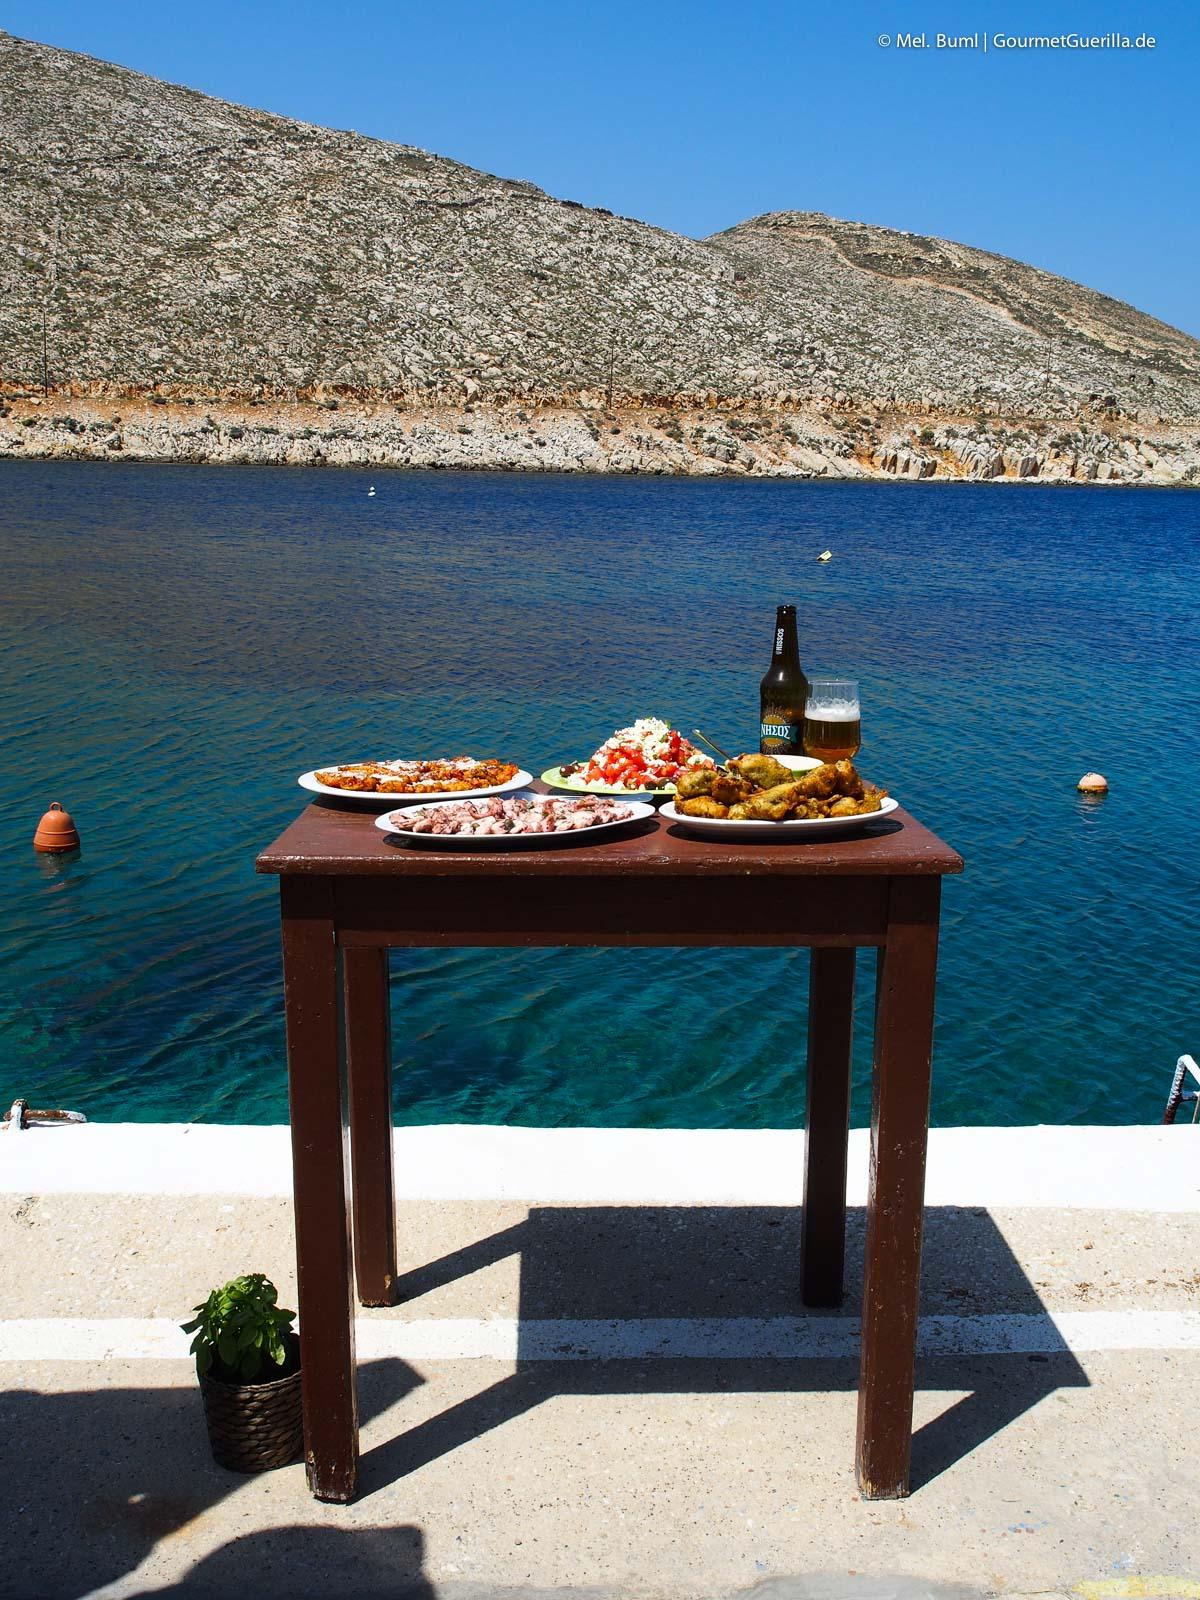 Essen am Meer Reisebericht Tinos Foodpath griechische Insel Kykladen Griechenland |GourmetGuerilla.de